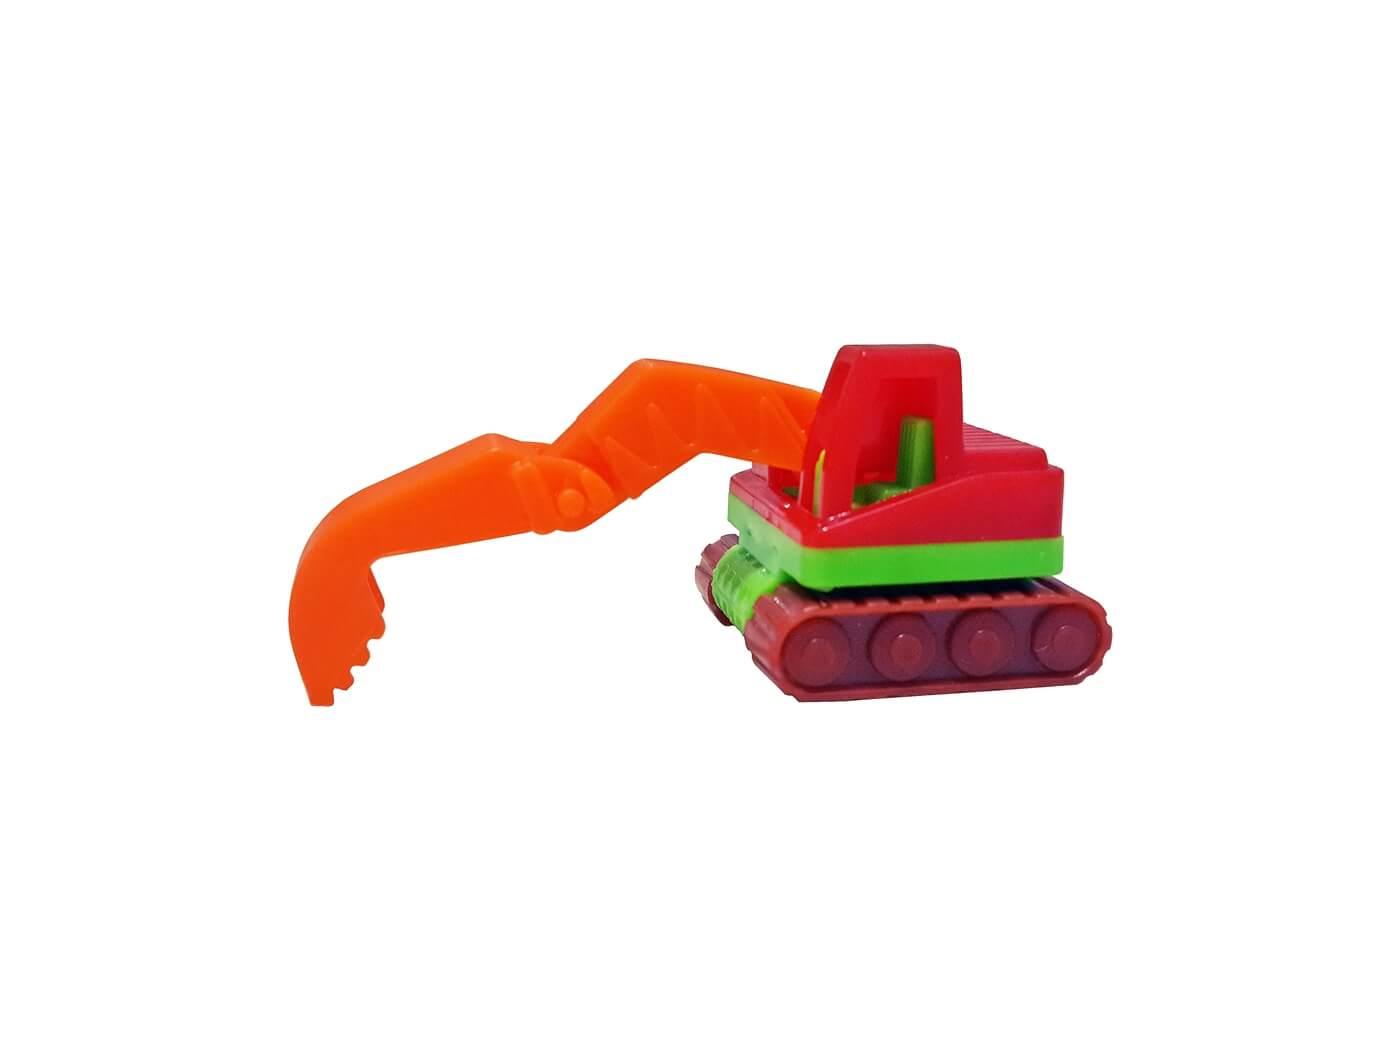 Excavator Toy on White Background, Construction Machine Toy